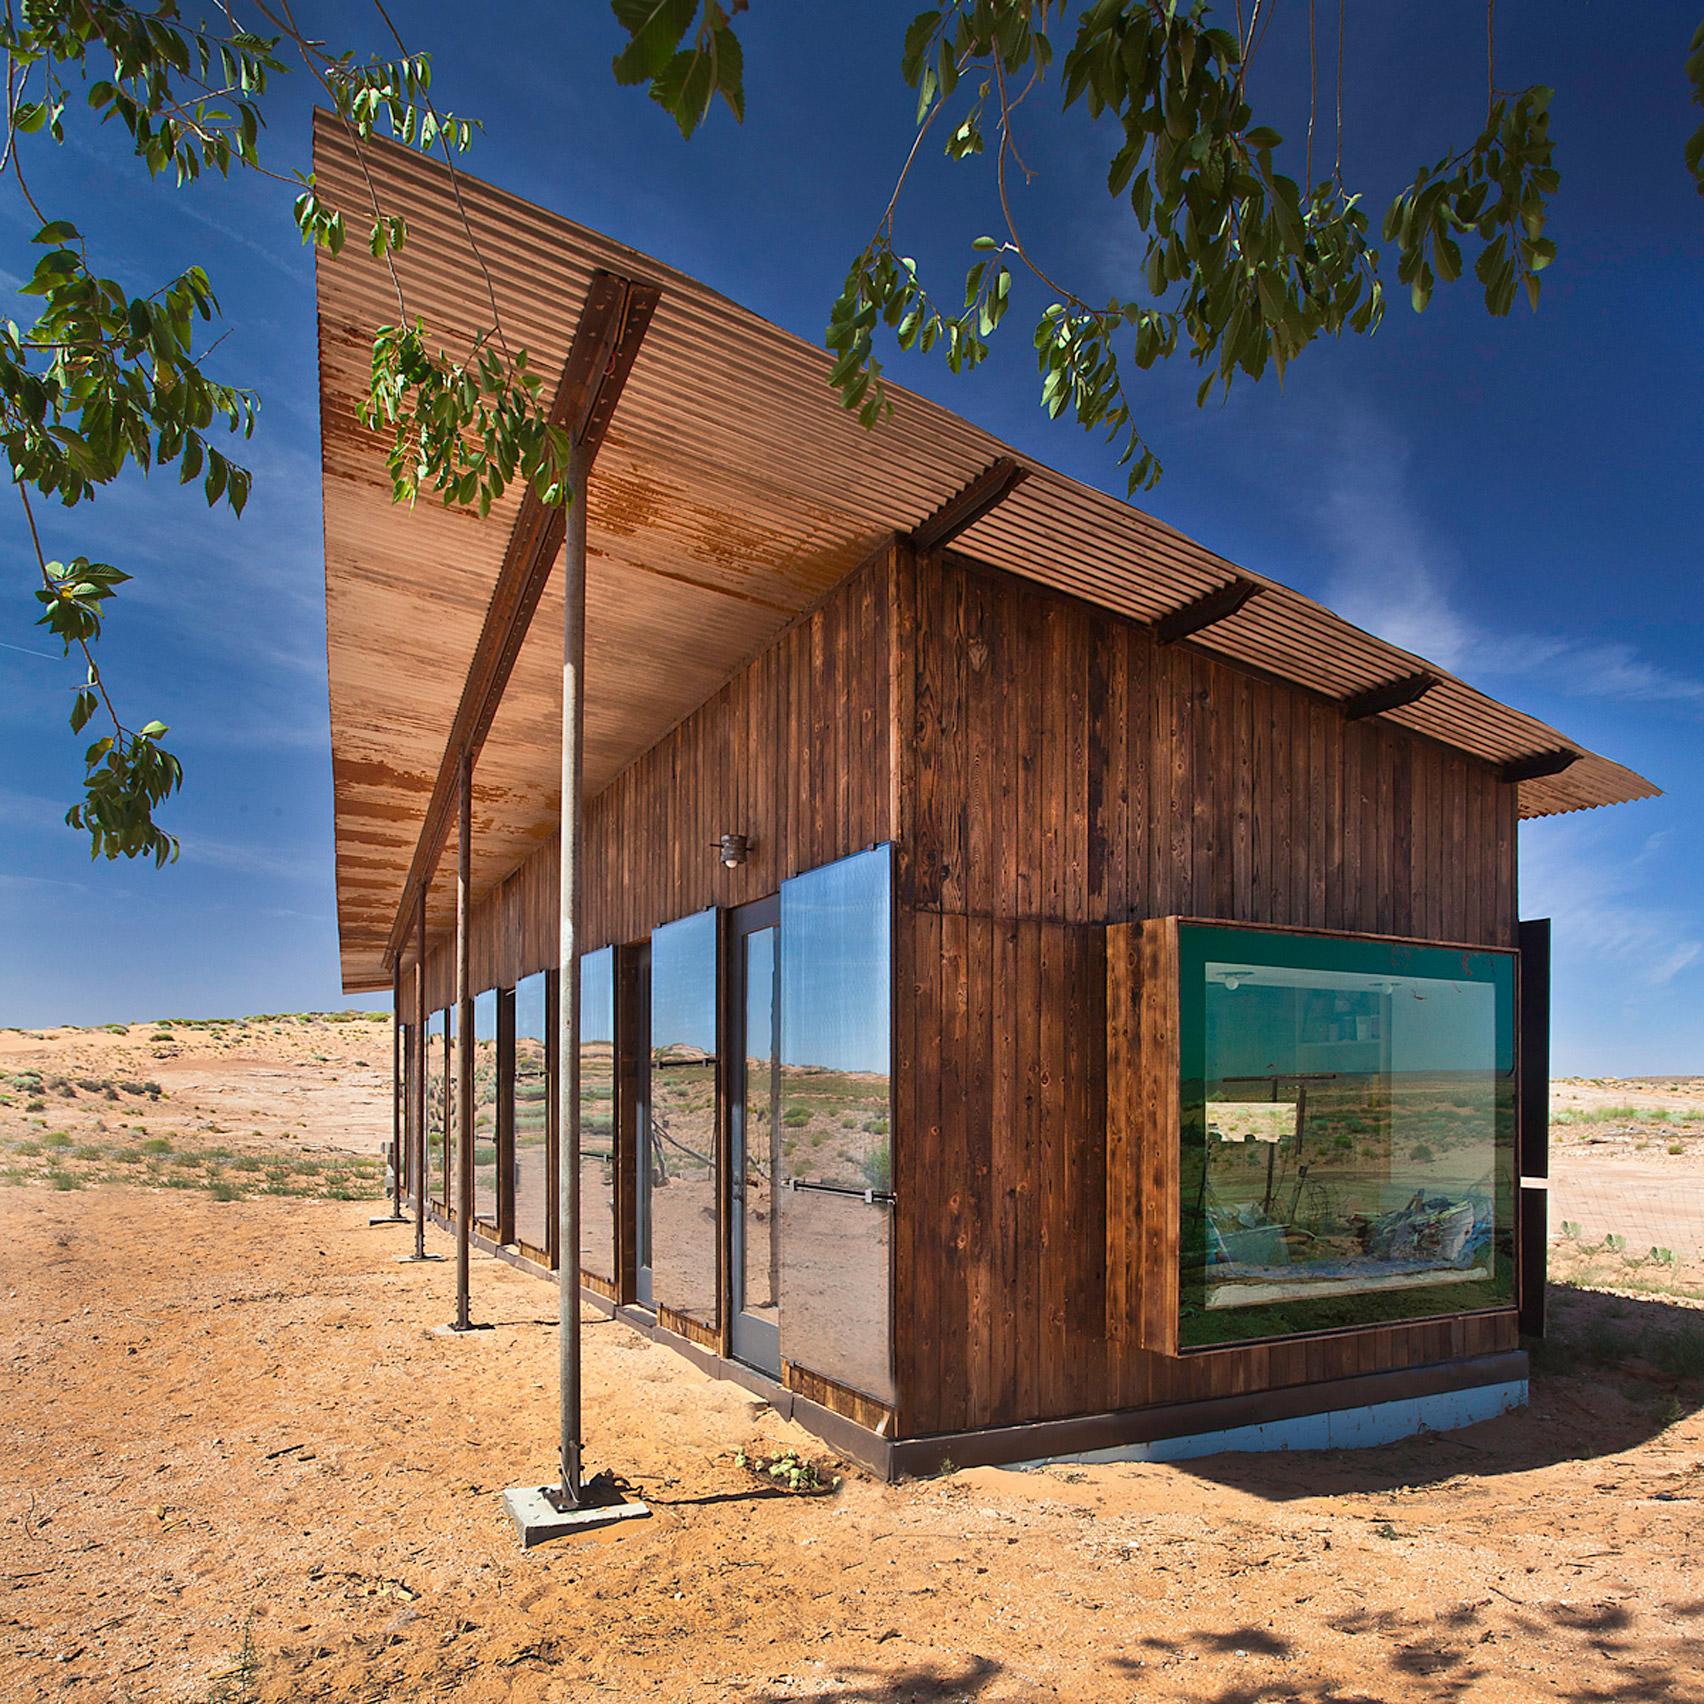 Utah Home Design Architects: 3Novices:10 Desert Houses That Make The Most Of Arid